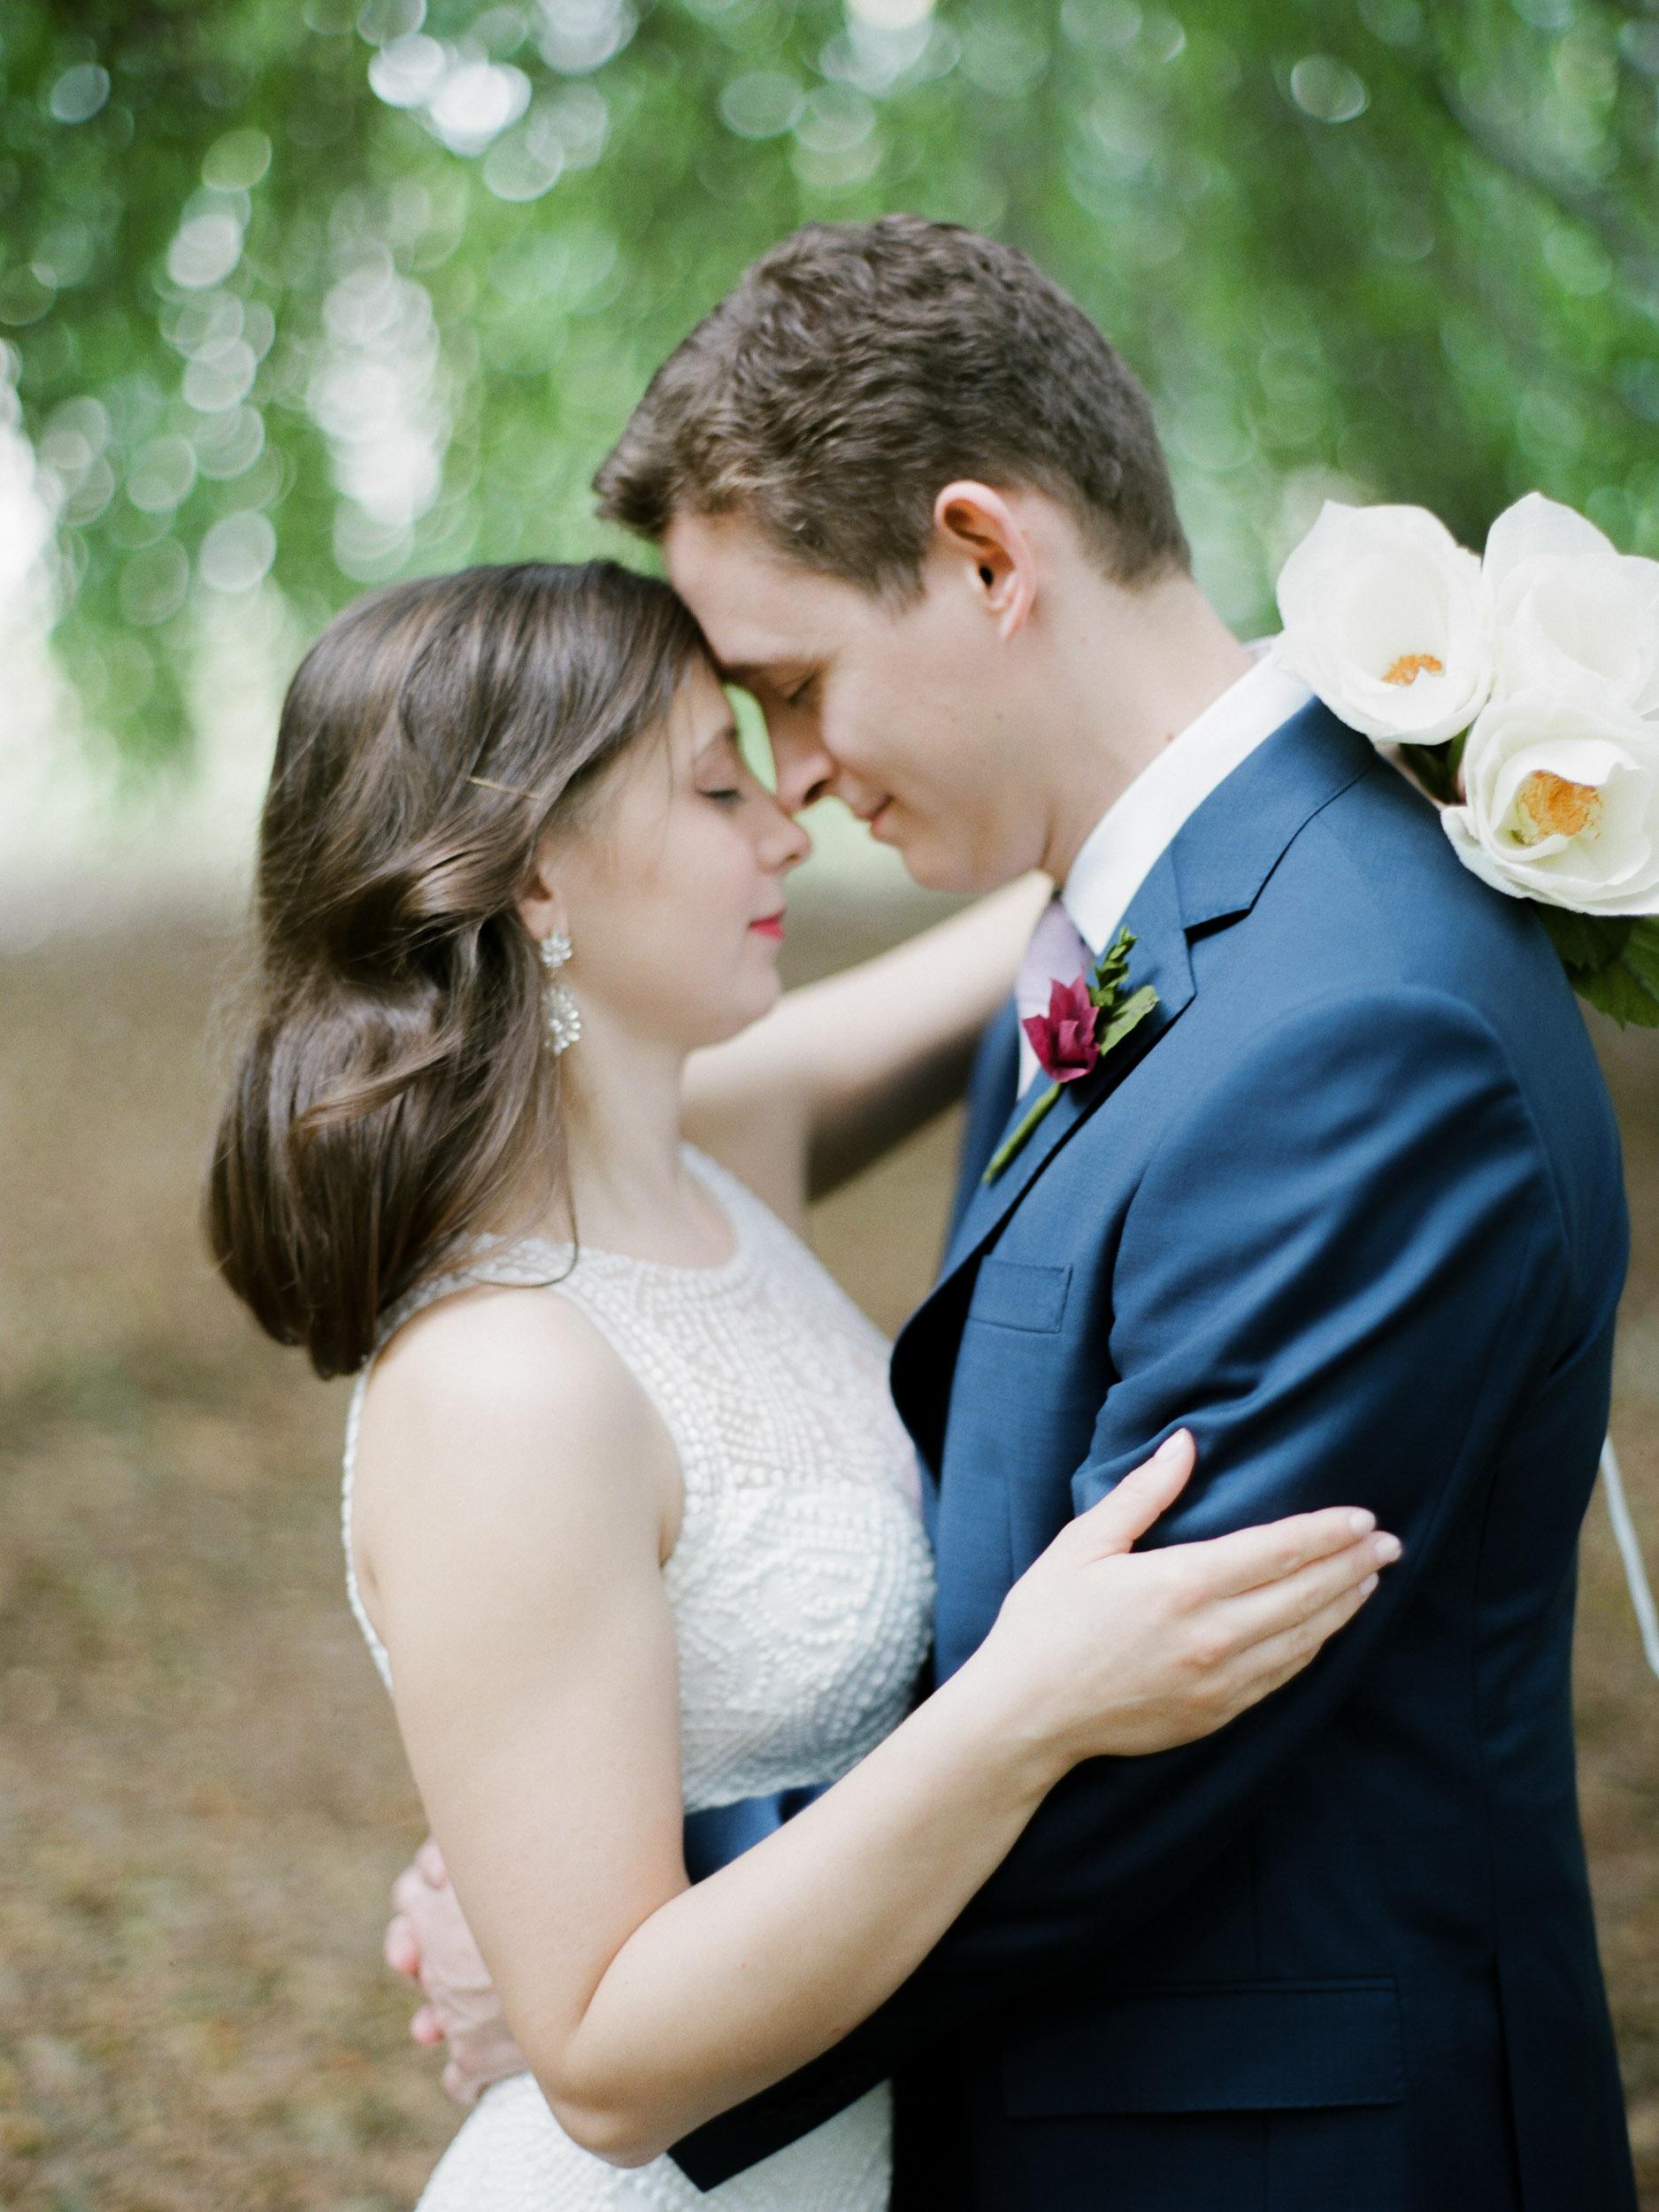 Top wedding photographers in Mass